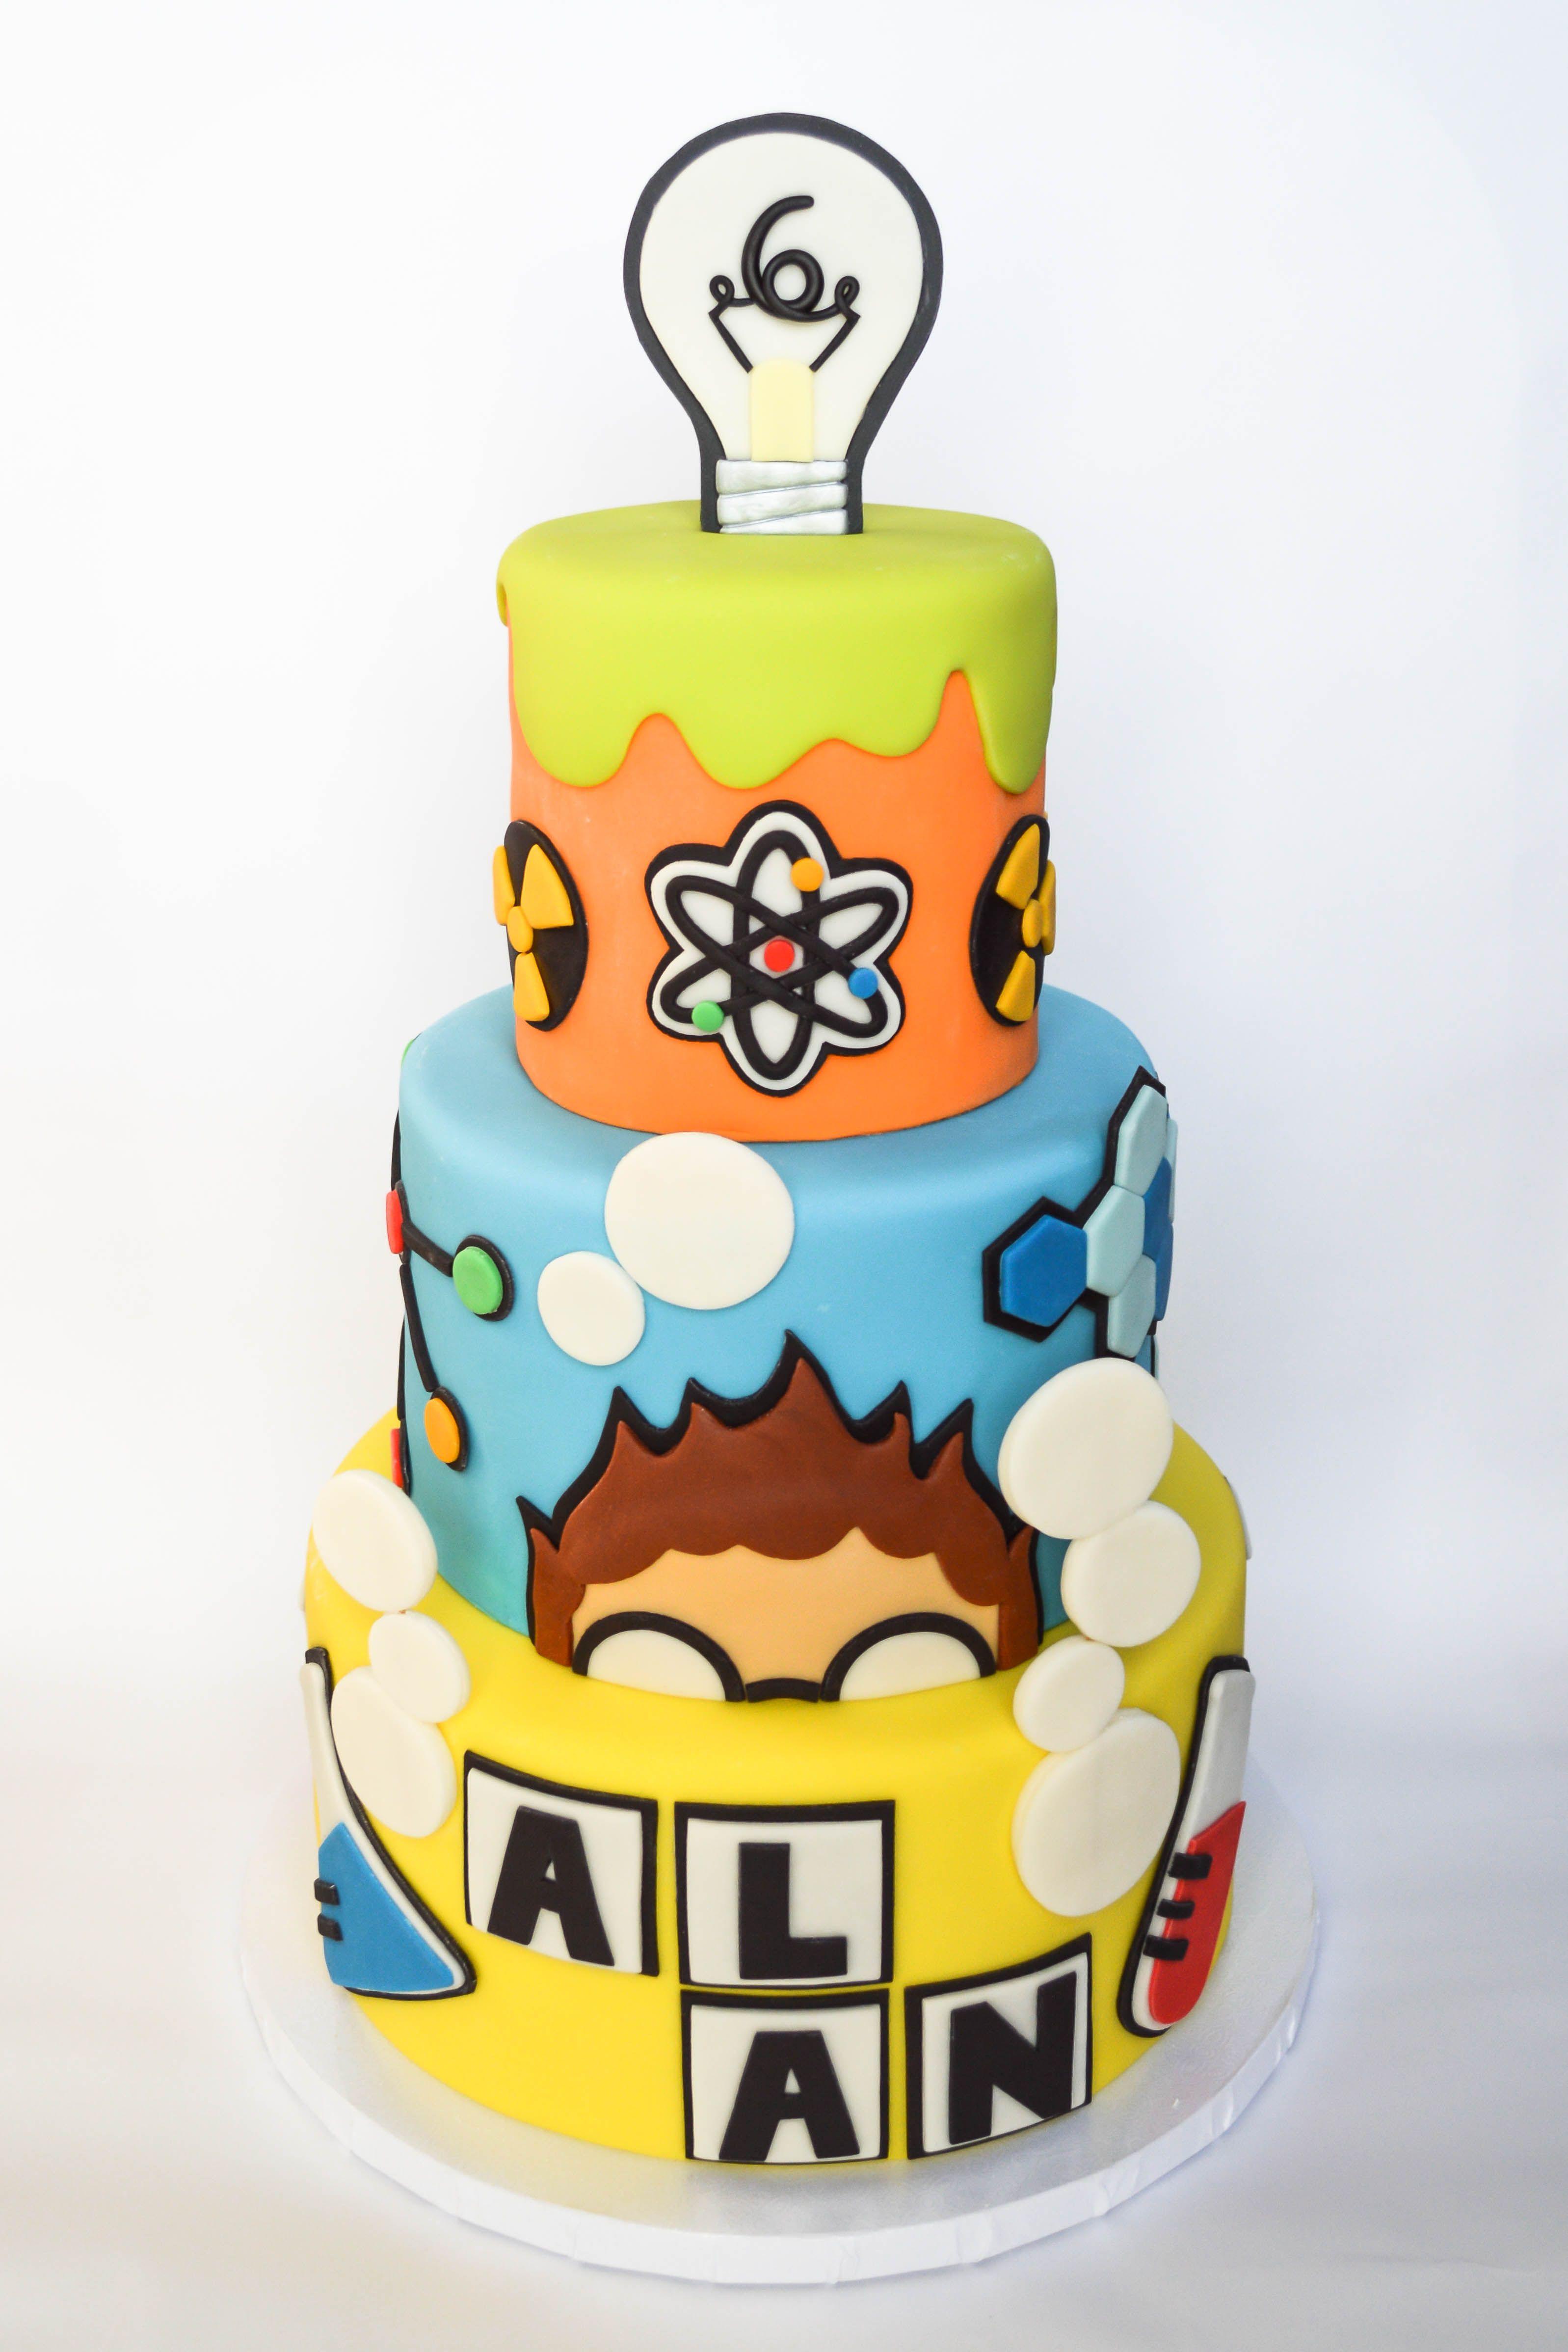 Phenomenal Science Themed Birthday Cake With Images Boy Birthday Cake Birthday Cards Printable Inklcafe Filternl